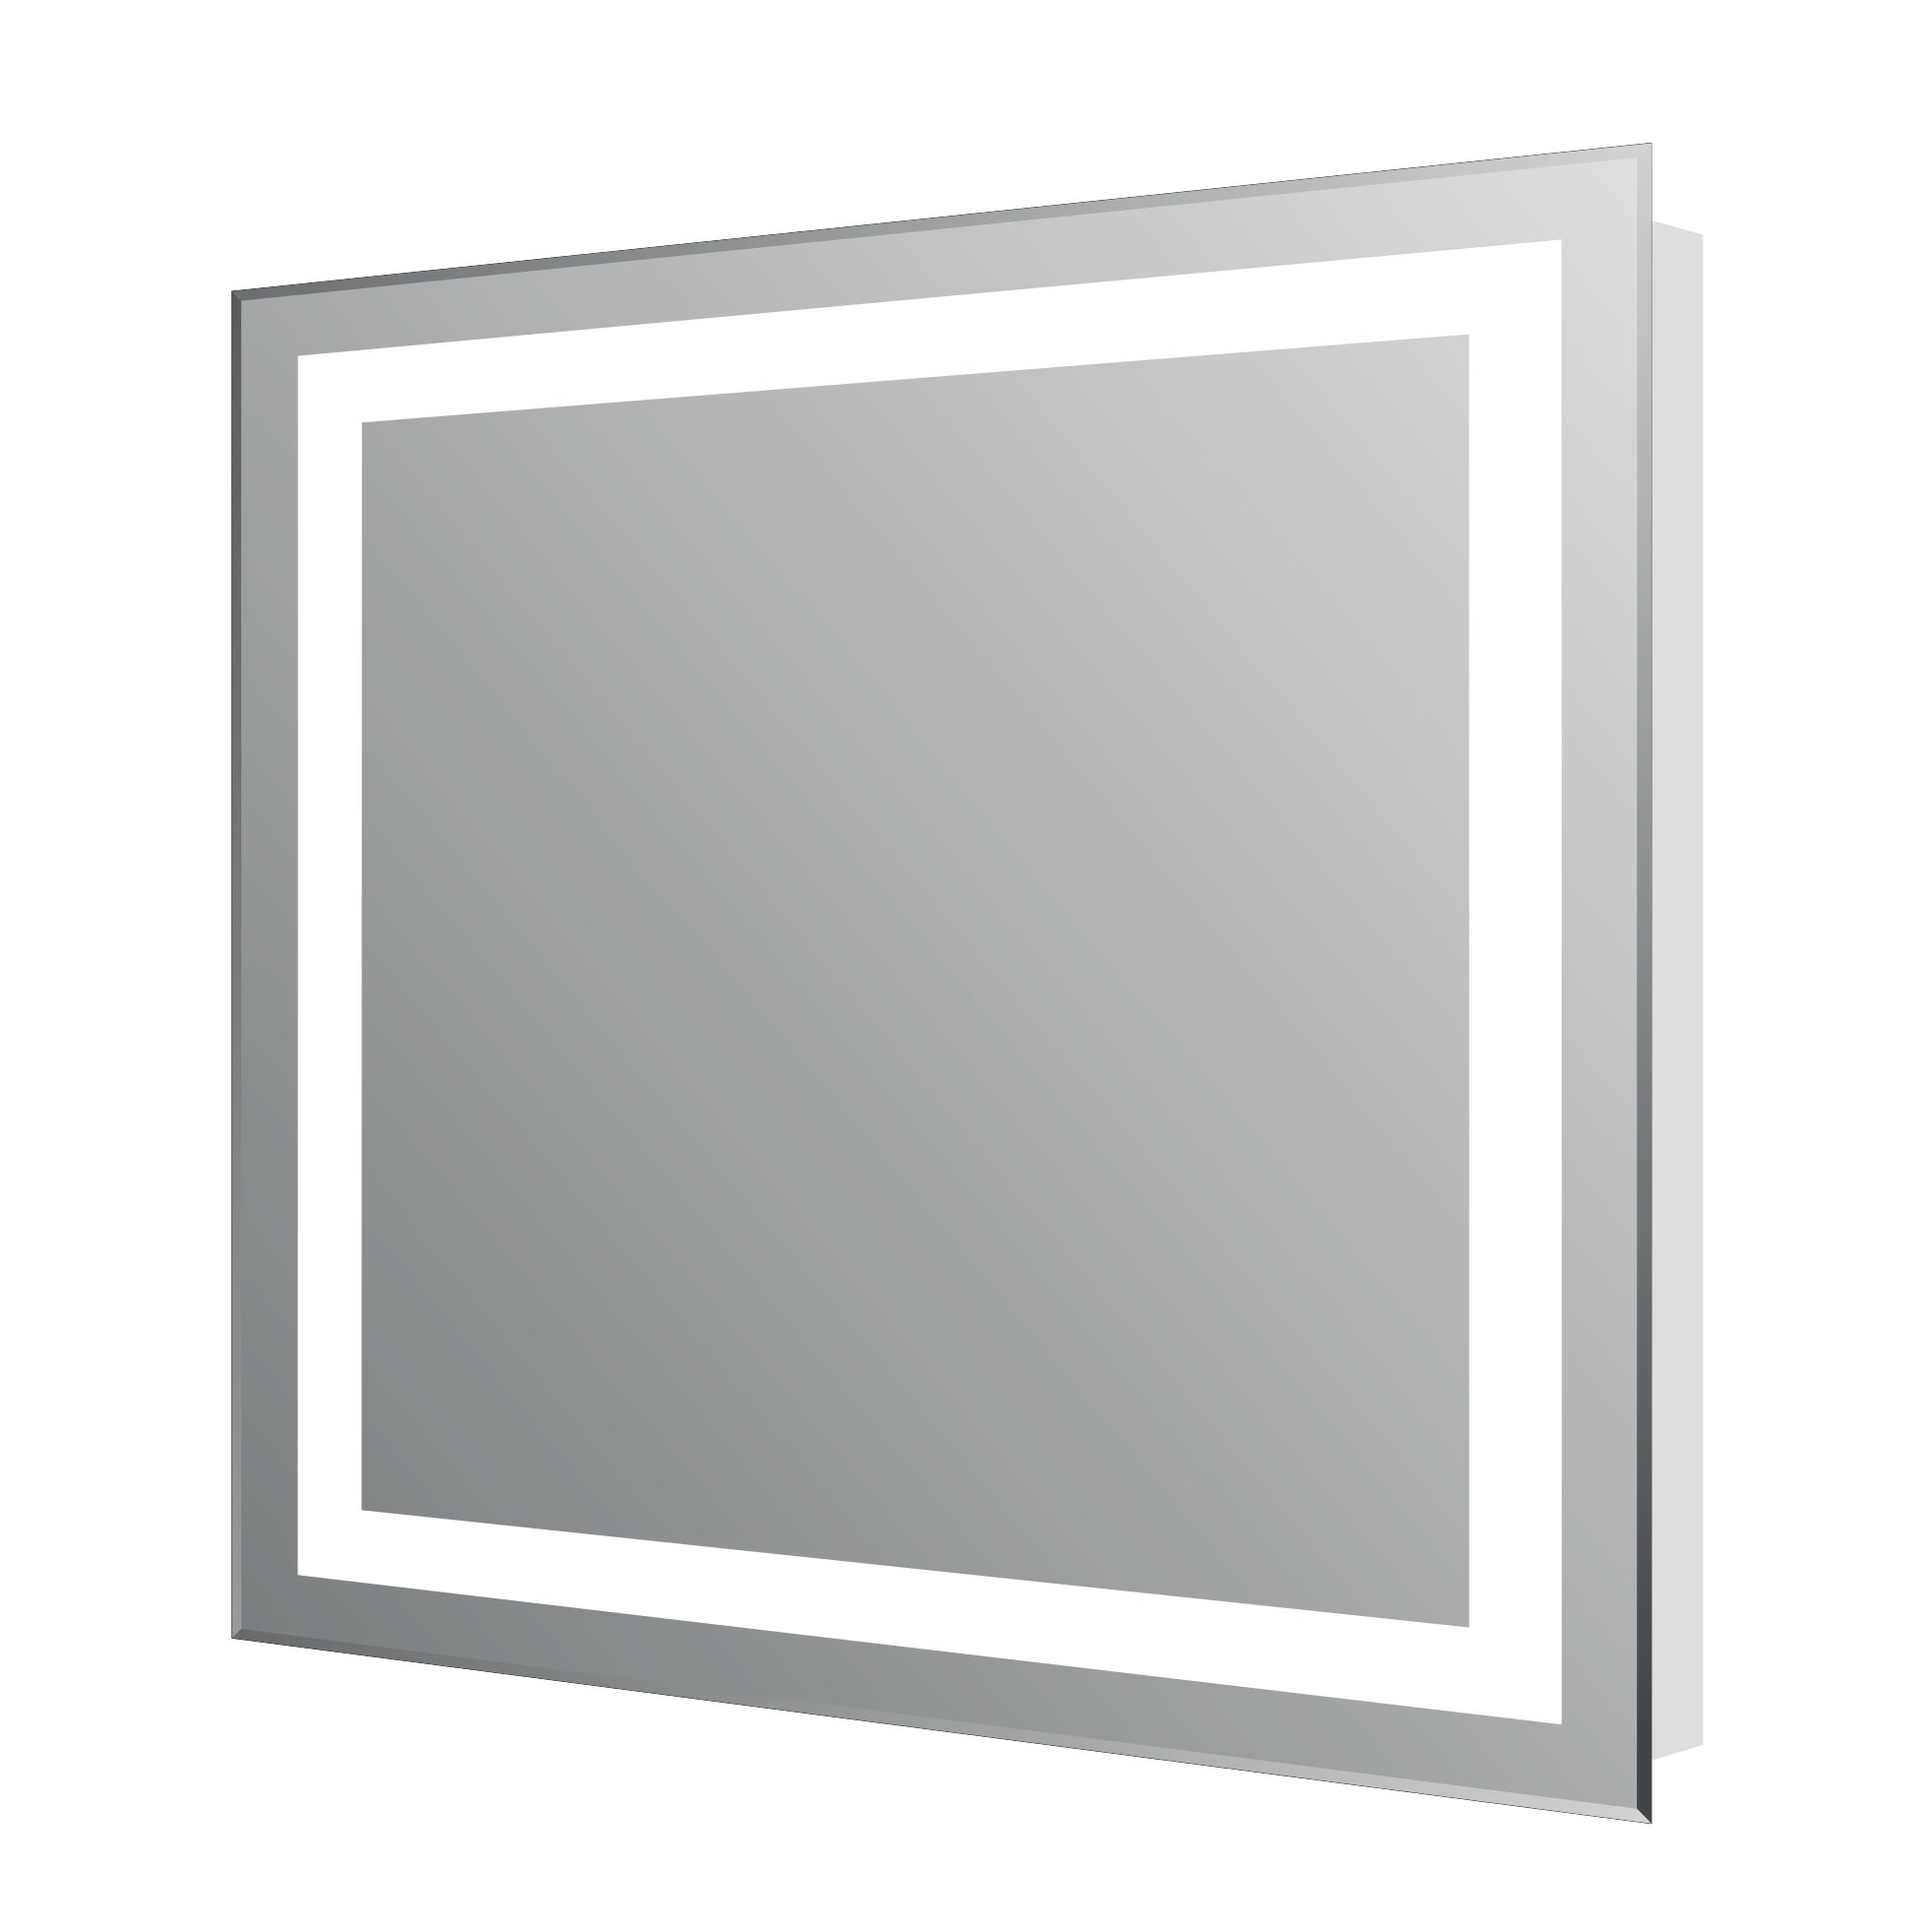 Eviva Evmr34 24x30 Led Lite Wall Mounted Modern Bathroom Vanity Backlit Lighted Led Mirror Silver Overstock 13935077